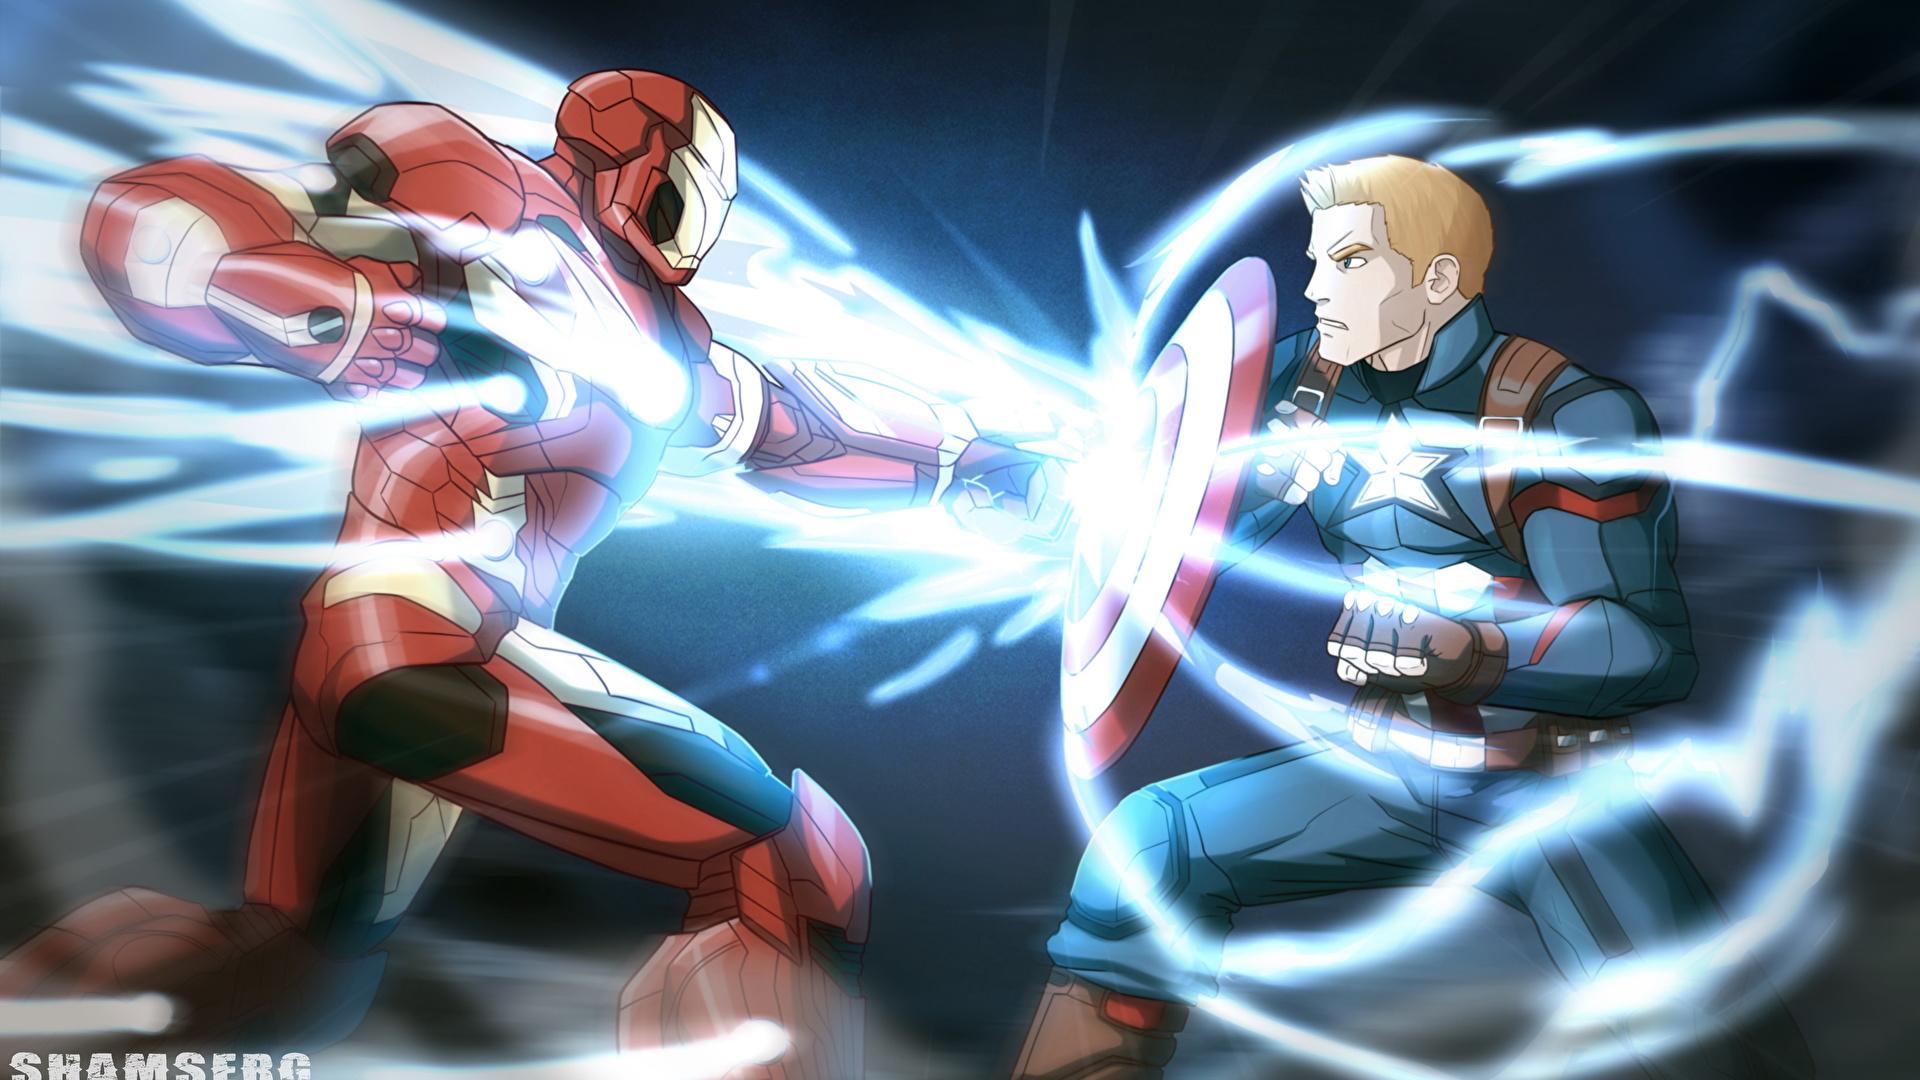 Image Captain America: Civil War Shield Iron Man hero Captain America hero Tony Stark Two Fantasy film Battles 1920x1080 2 Movies fighting